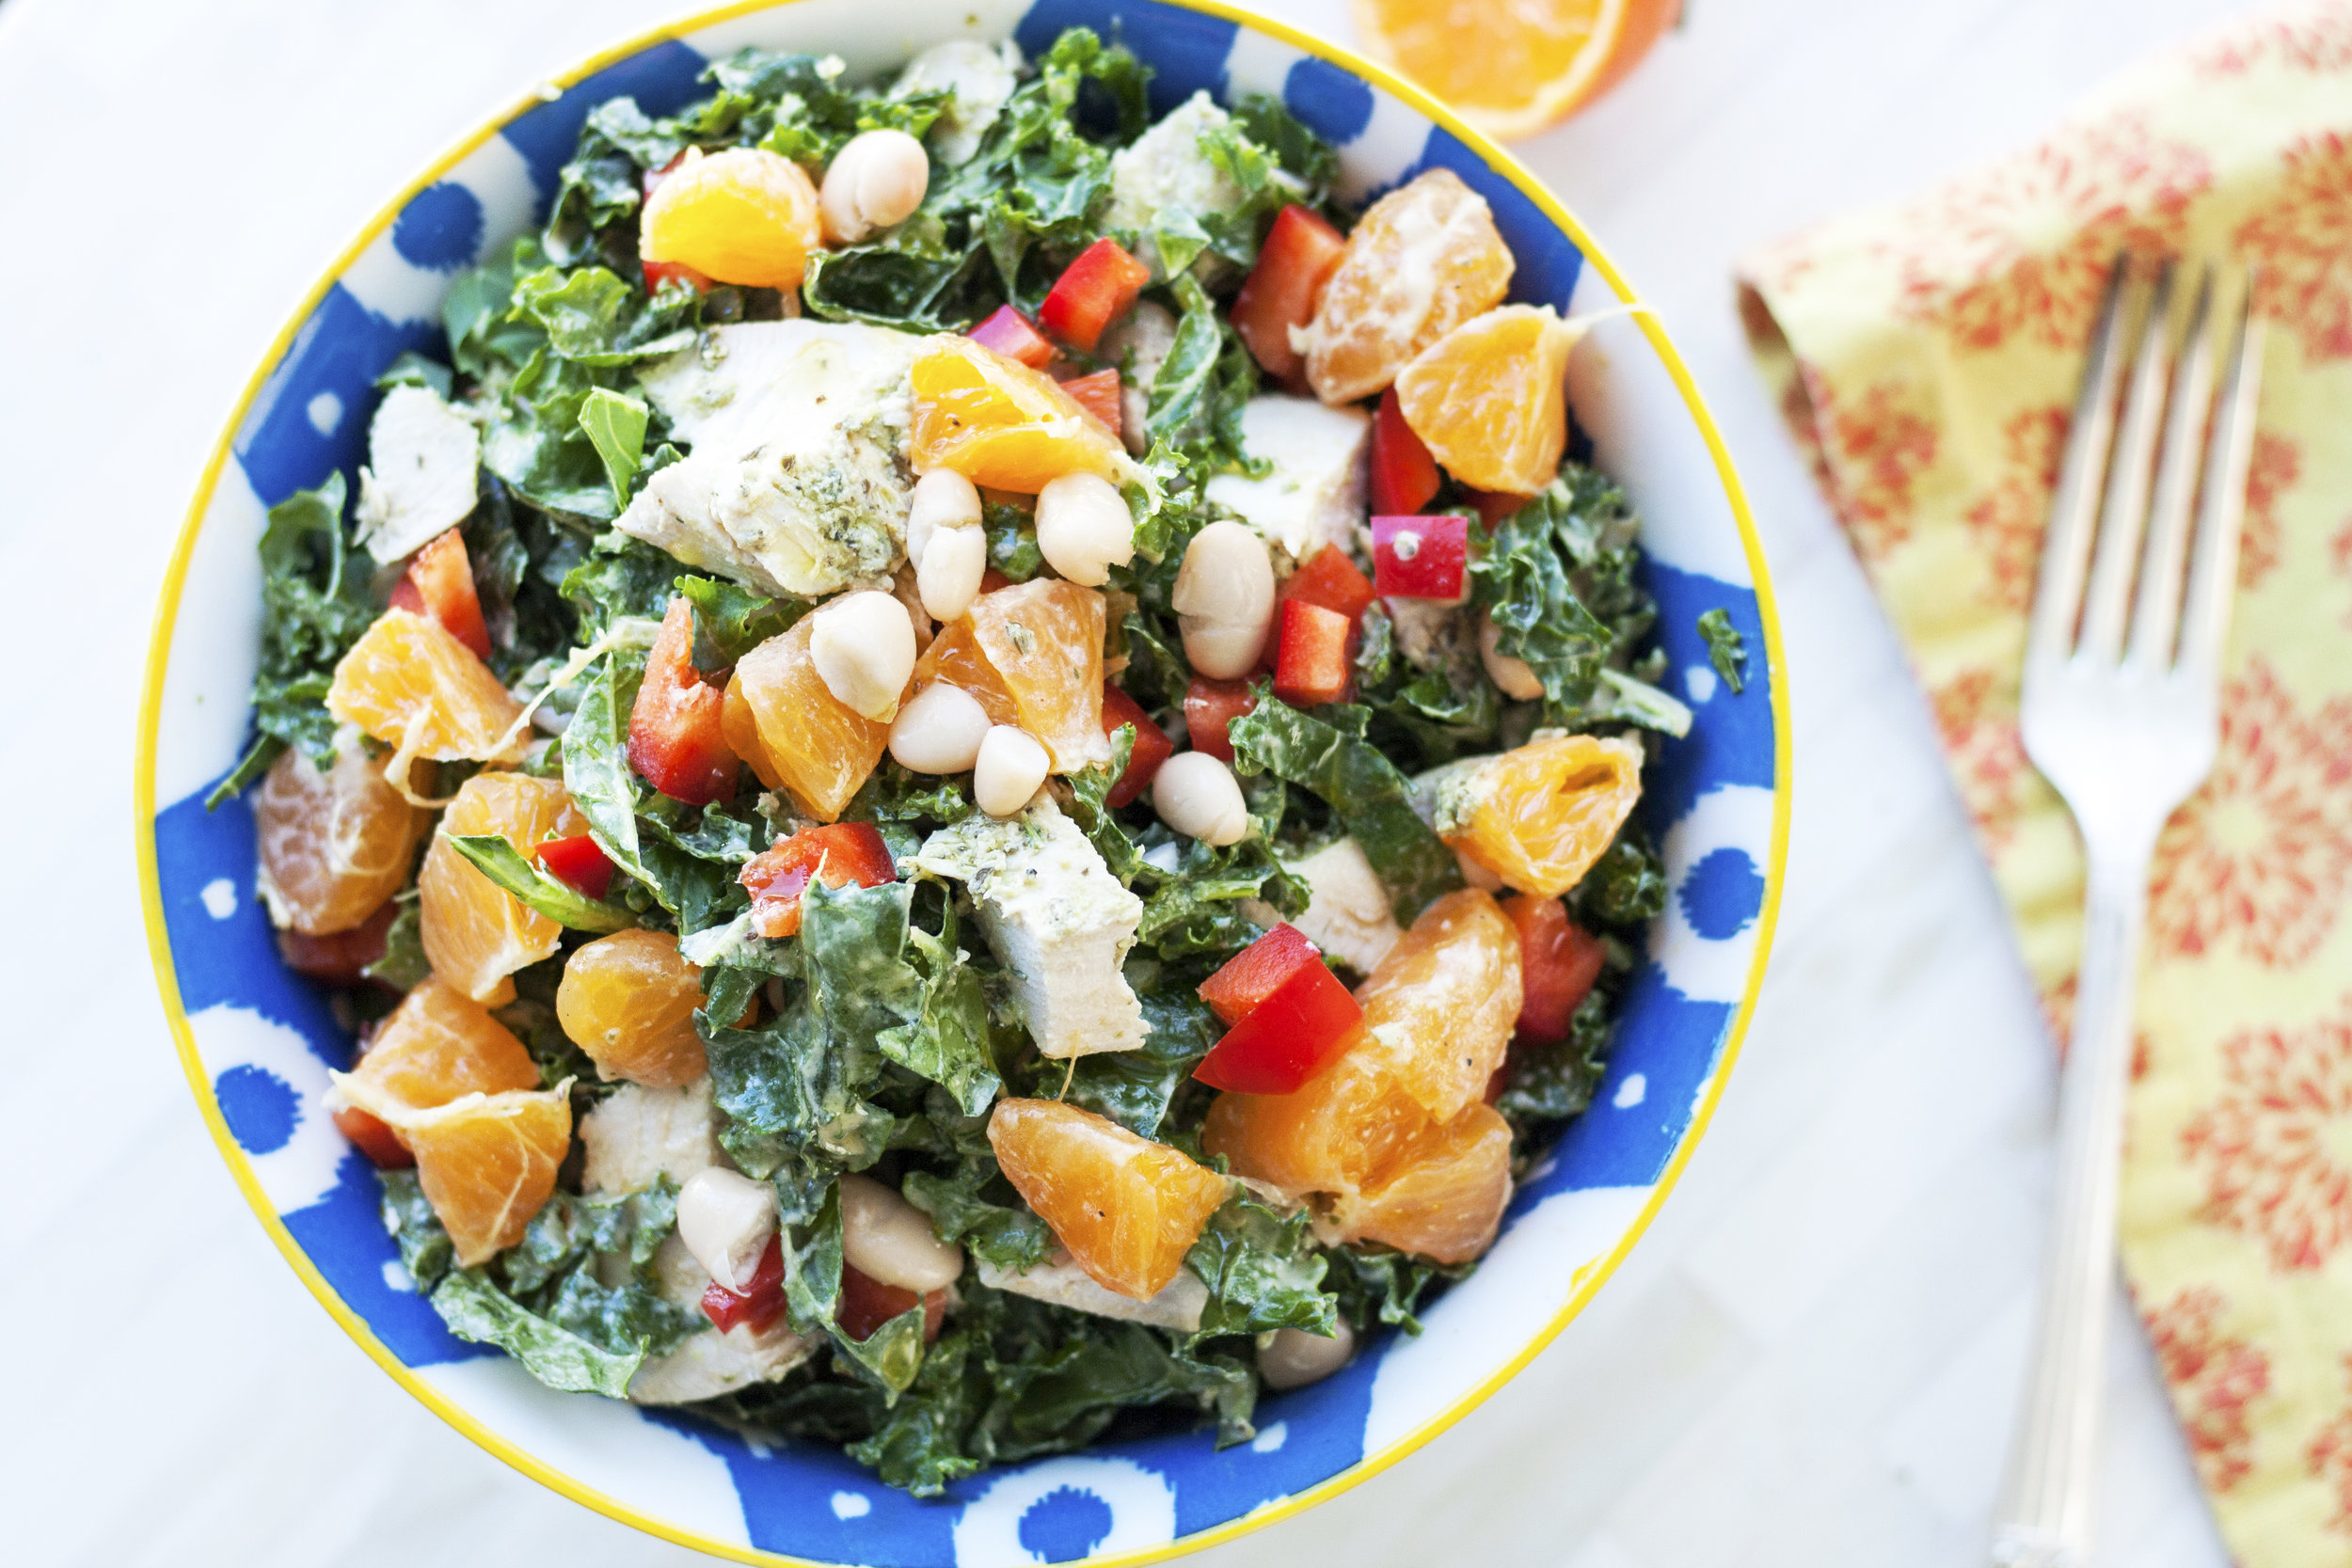 Lemon Tahini Kale Salad by Alavita Prenatal Nutrition